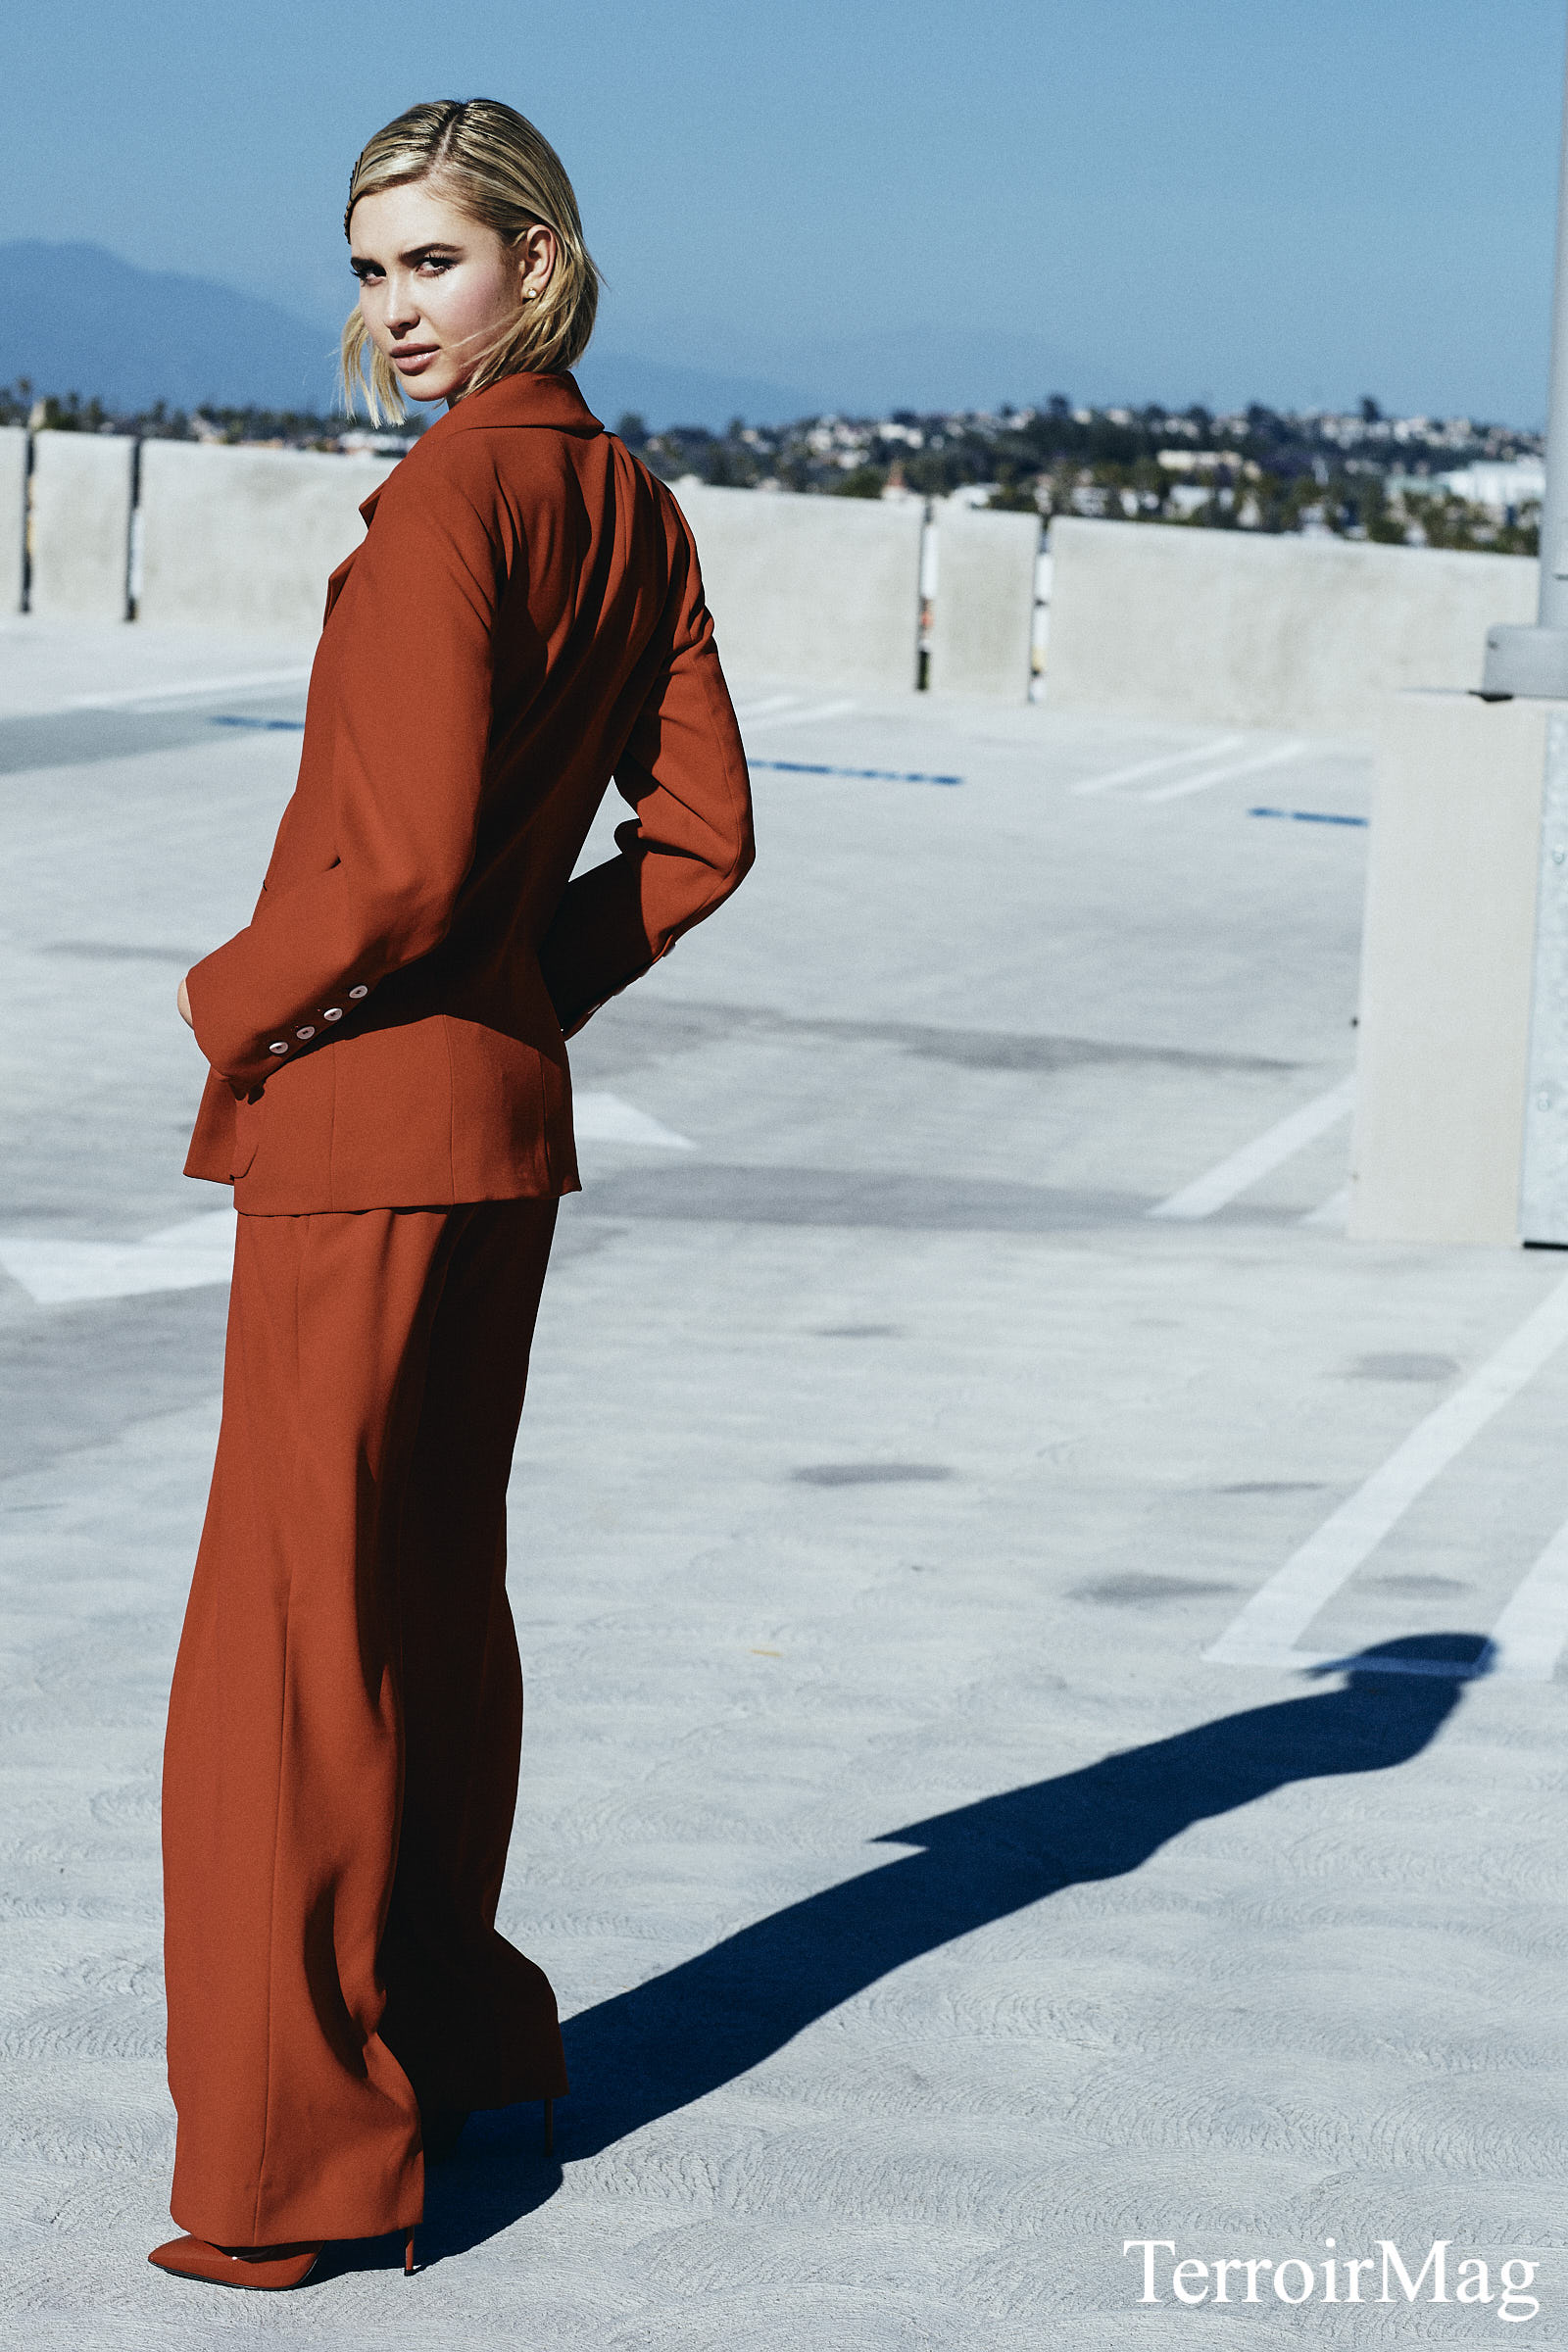 Red Suit: Zara Earrings: Caterina Jewelry  Shoes: Marco Proietti